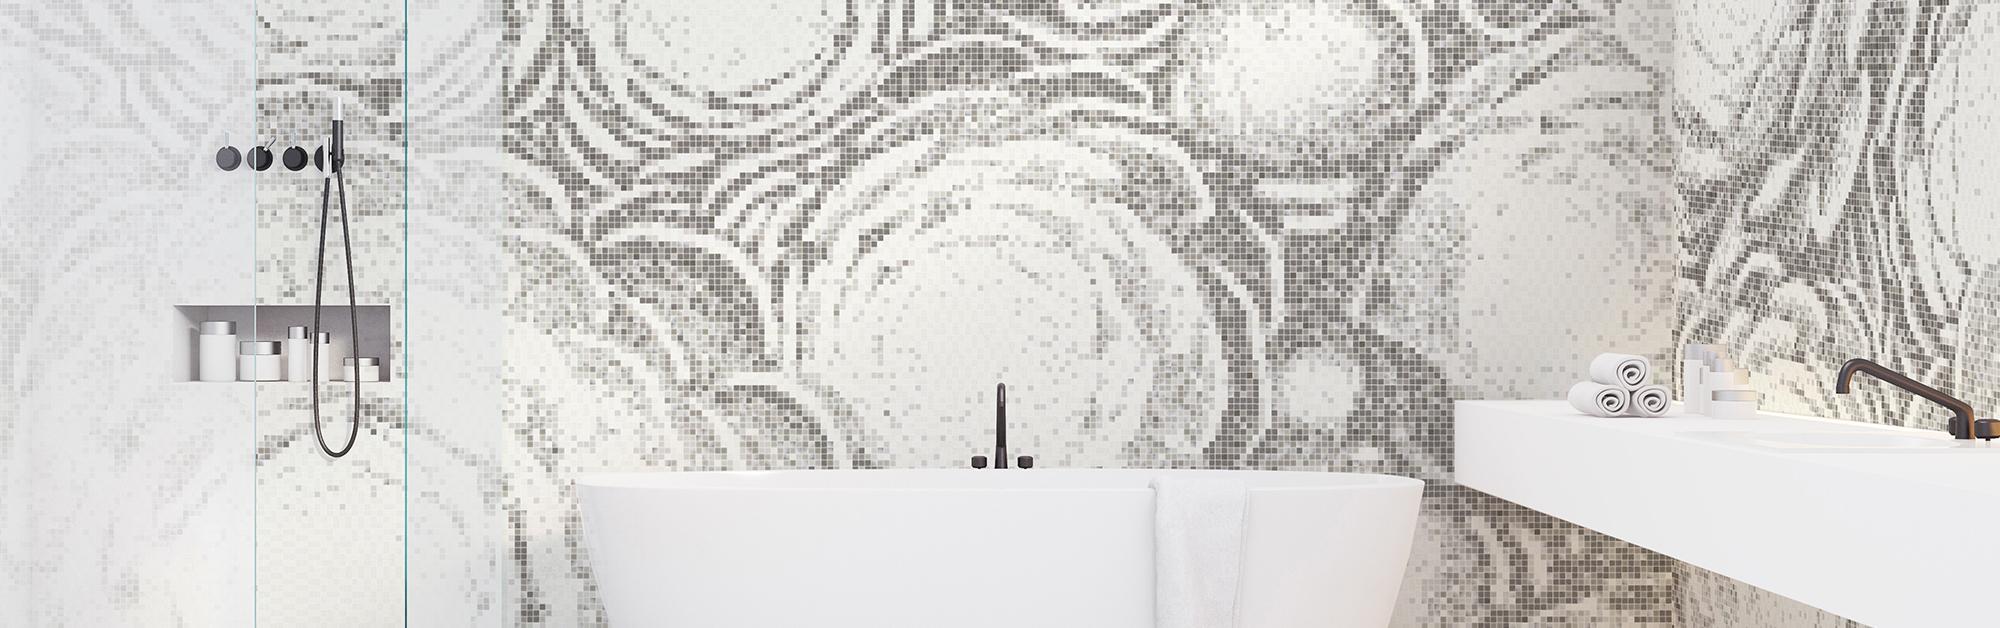 Bathroom - Commercial - Artaic